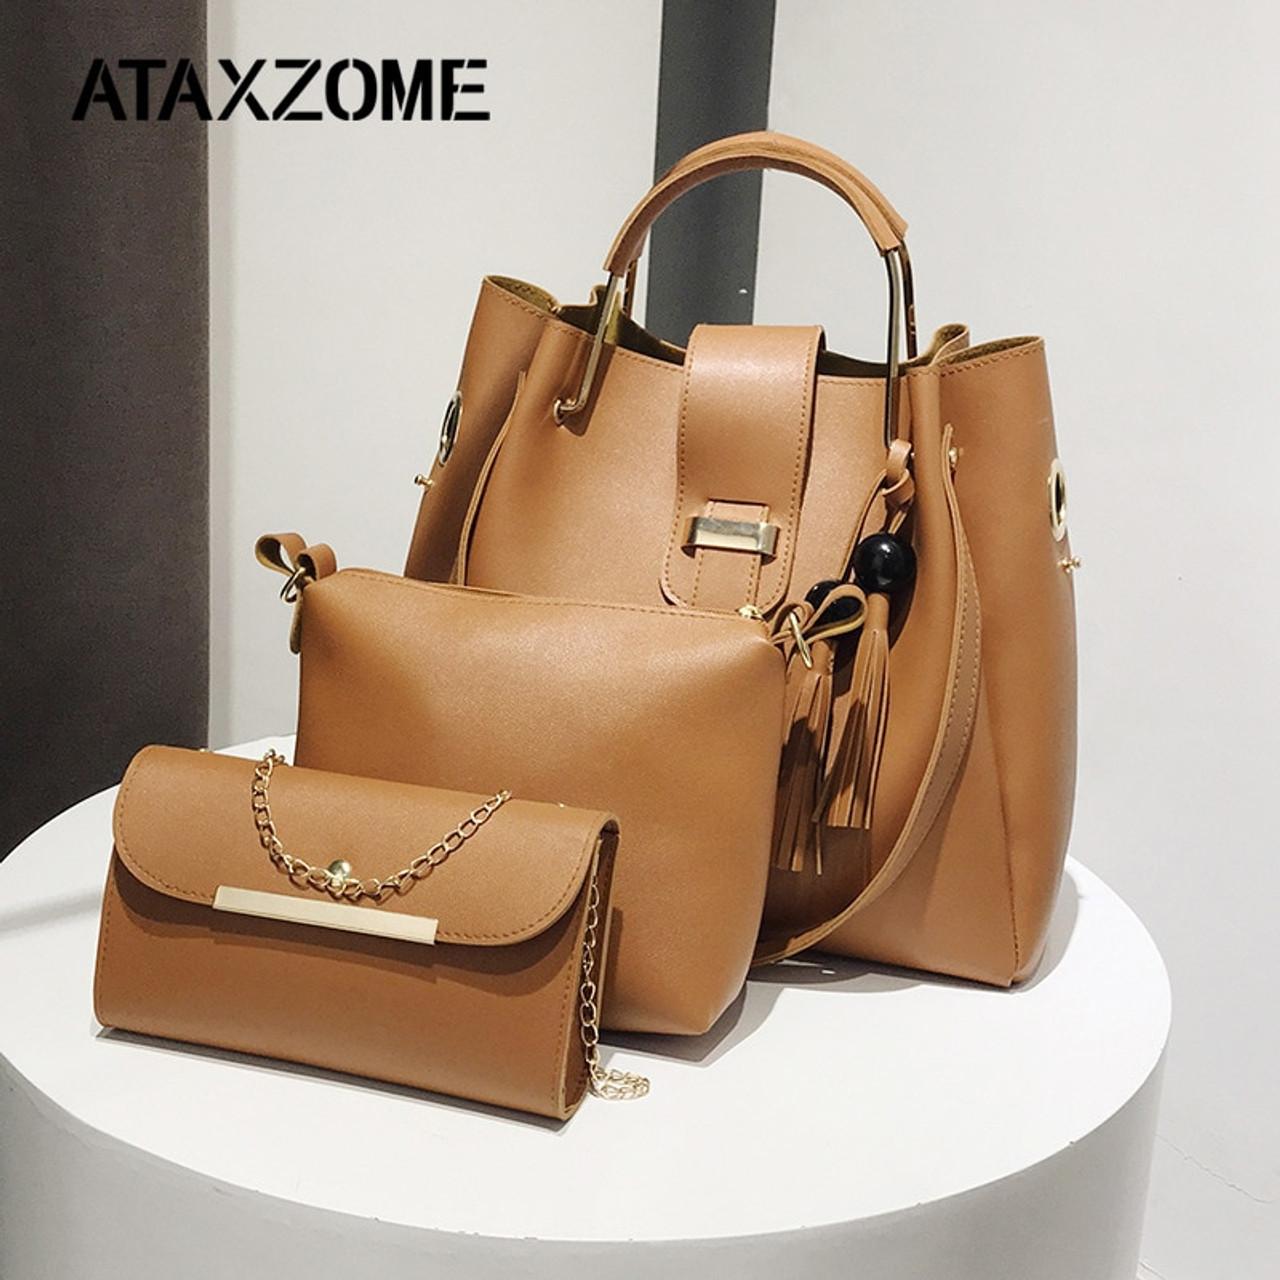 520c4588be0a ATAXZOME 3Pcs Set Crossbody Bags for Women 2018 Female Shoulder Composite  Handbags PU Leather Women ...